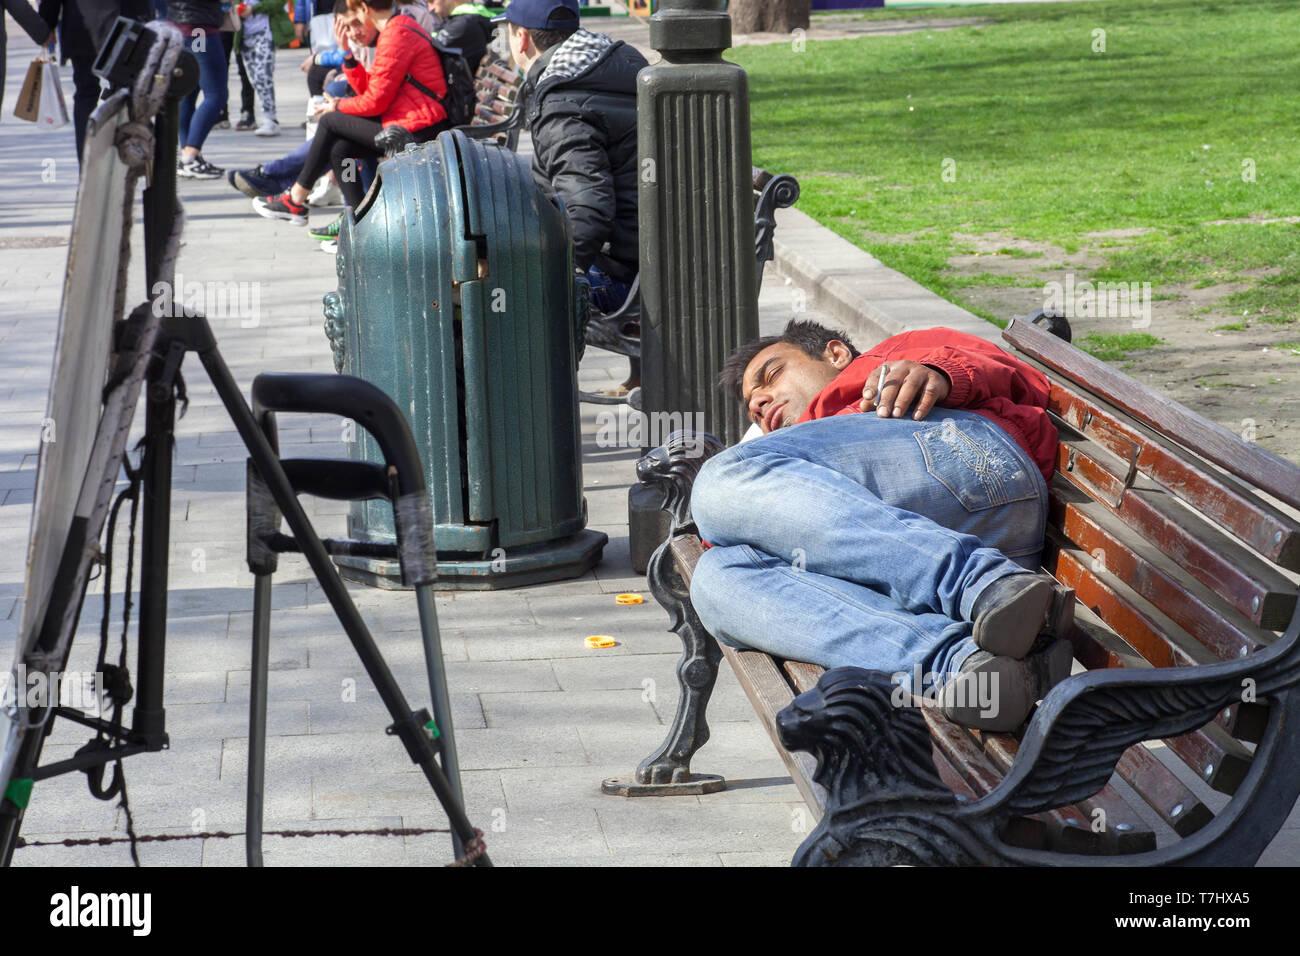 Lviv, Ukraine - 14 April 2019: Homeless man sleeping with cigarette on wooden bench on city street - Stock Image